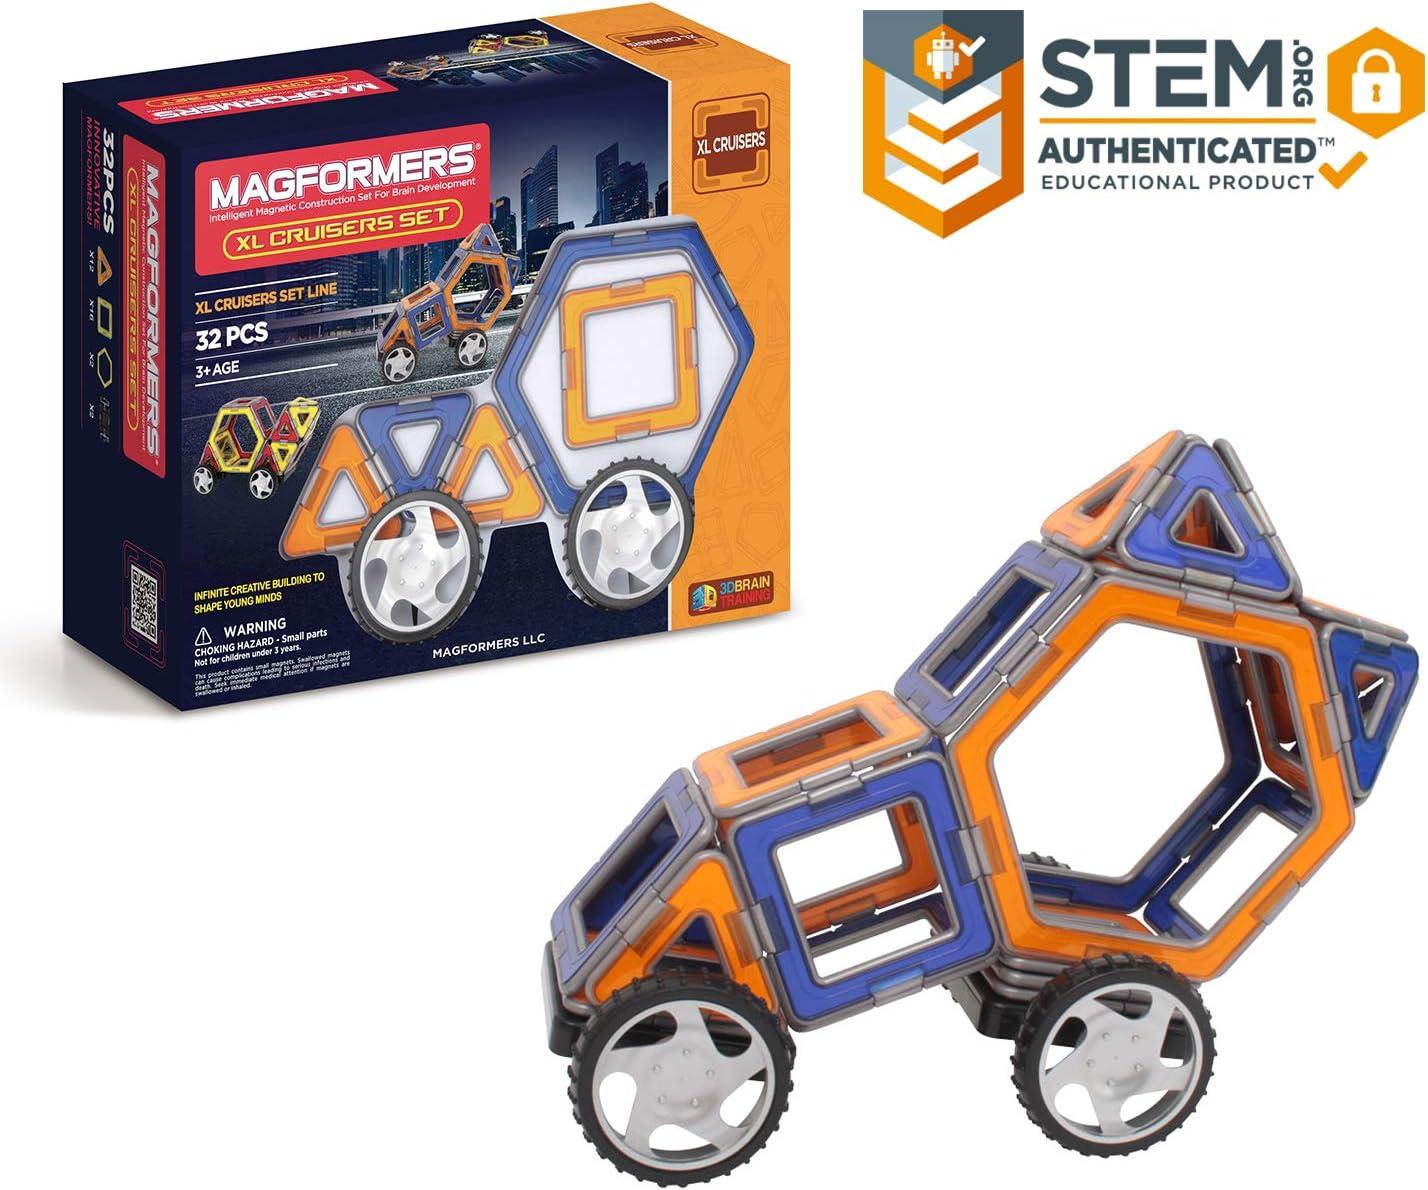 Magformers XL Cruisers Set (32-pieces) MagneticBuildingBlocks, Educational MagneticTiles Kit , MagneticConstructionSTEM Toy Set includes wheels